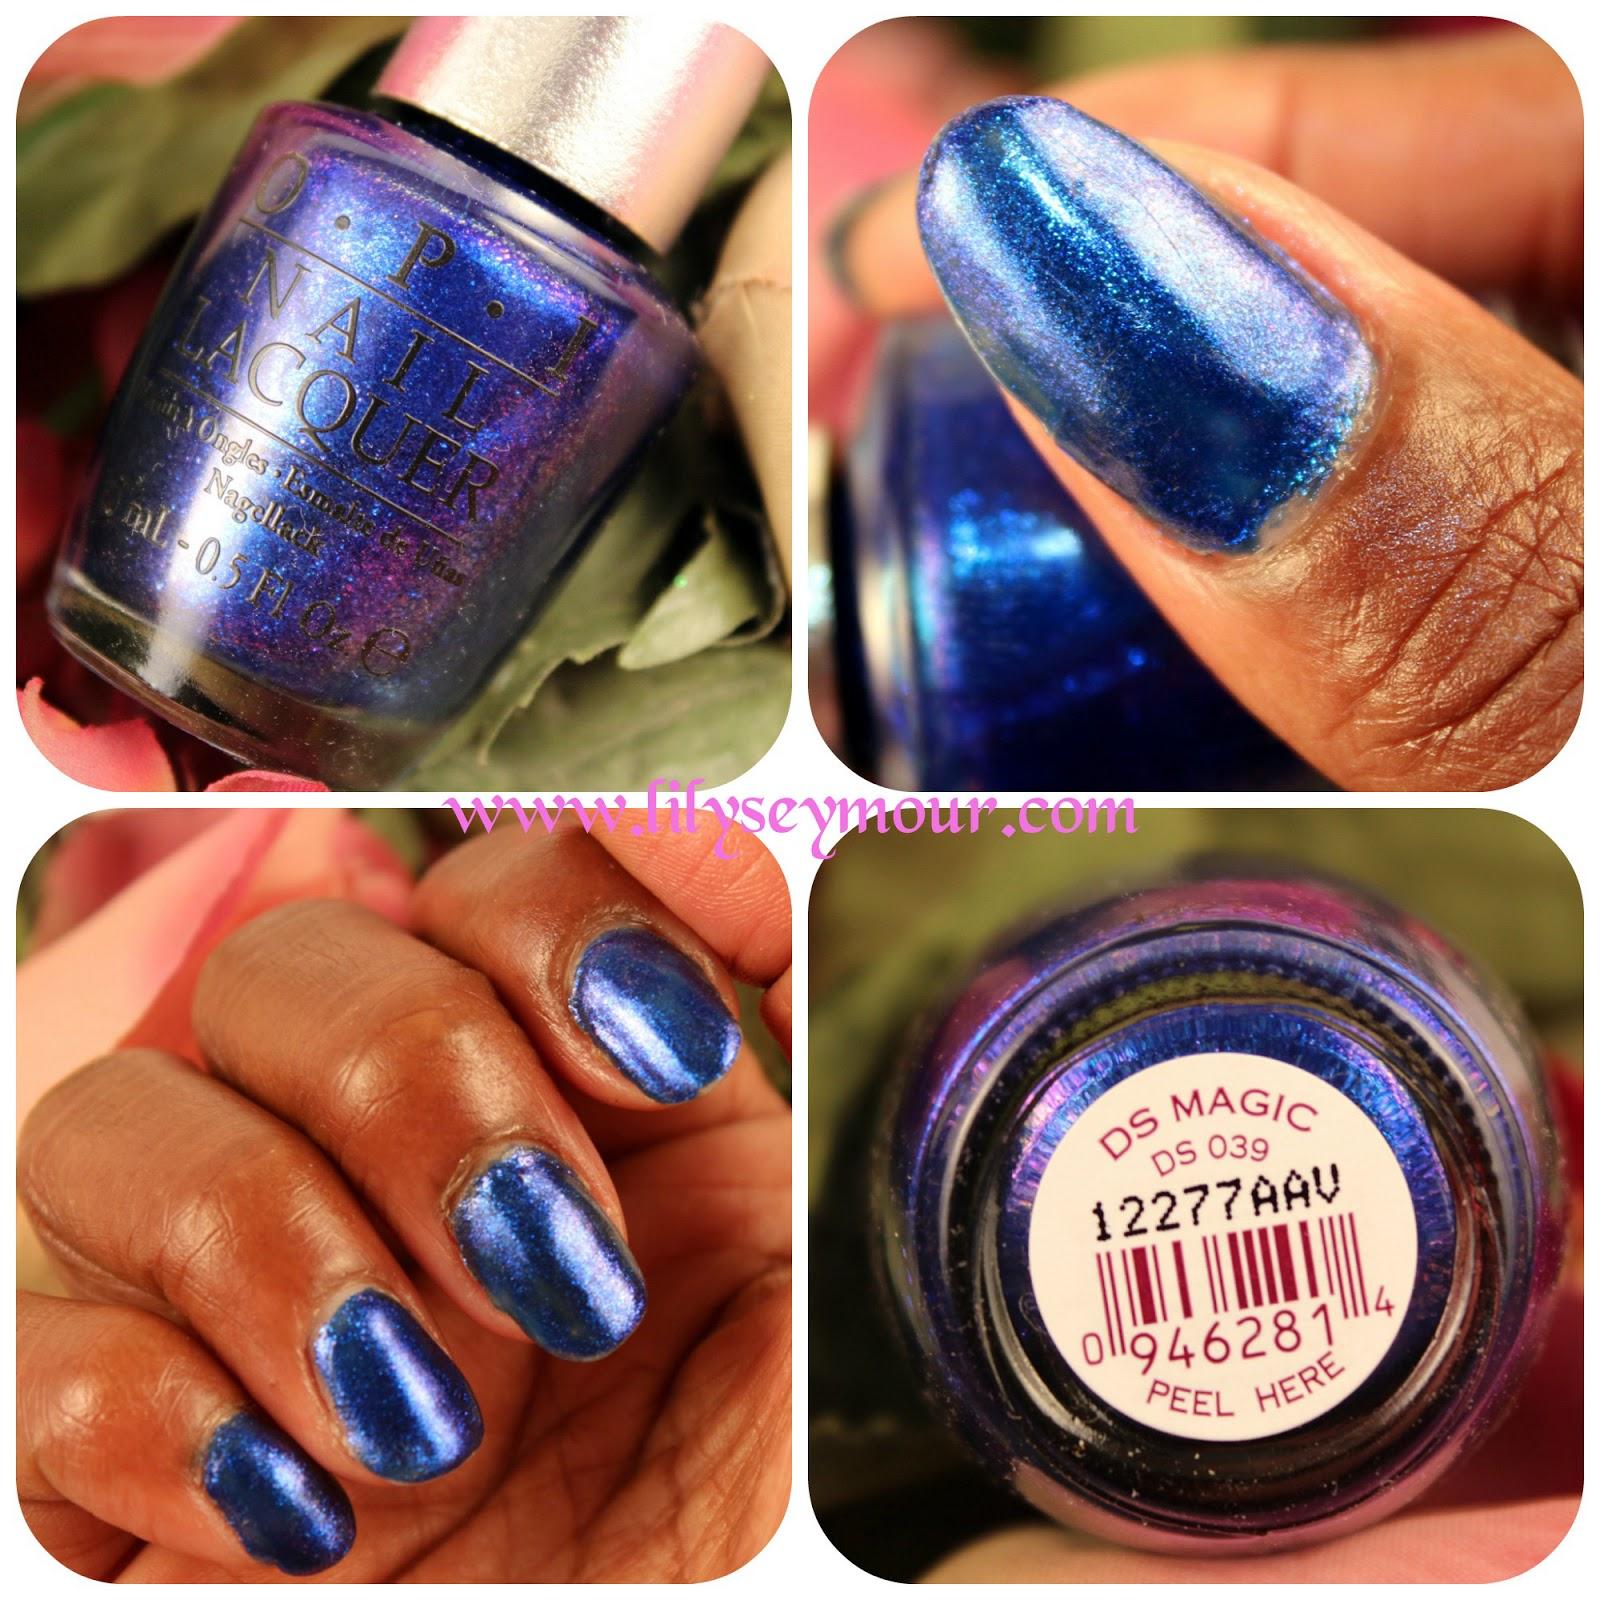 Fun Fierce Fabulous Beauty Over 50!: Nails ~ OPI\'s DS Magic Nail Polish